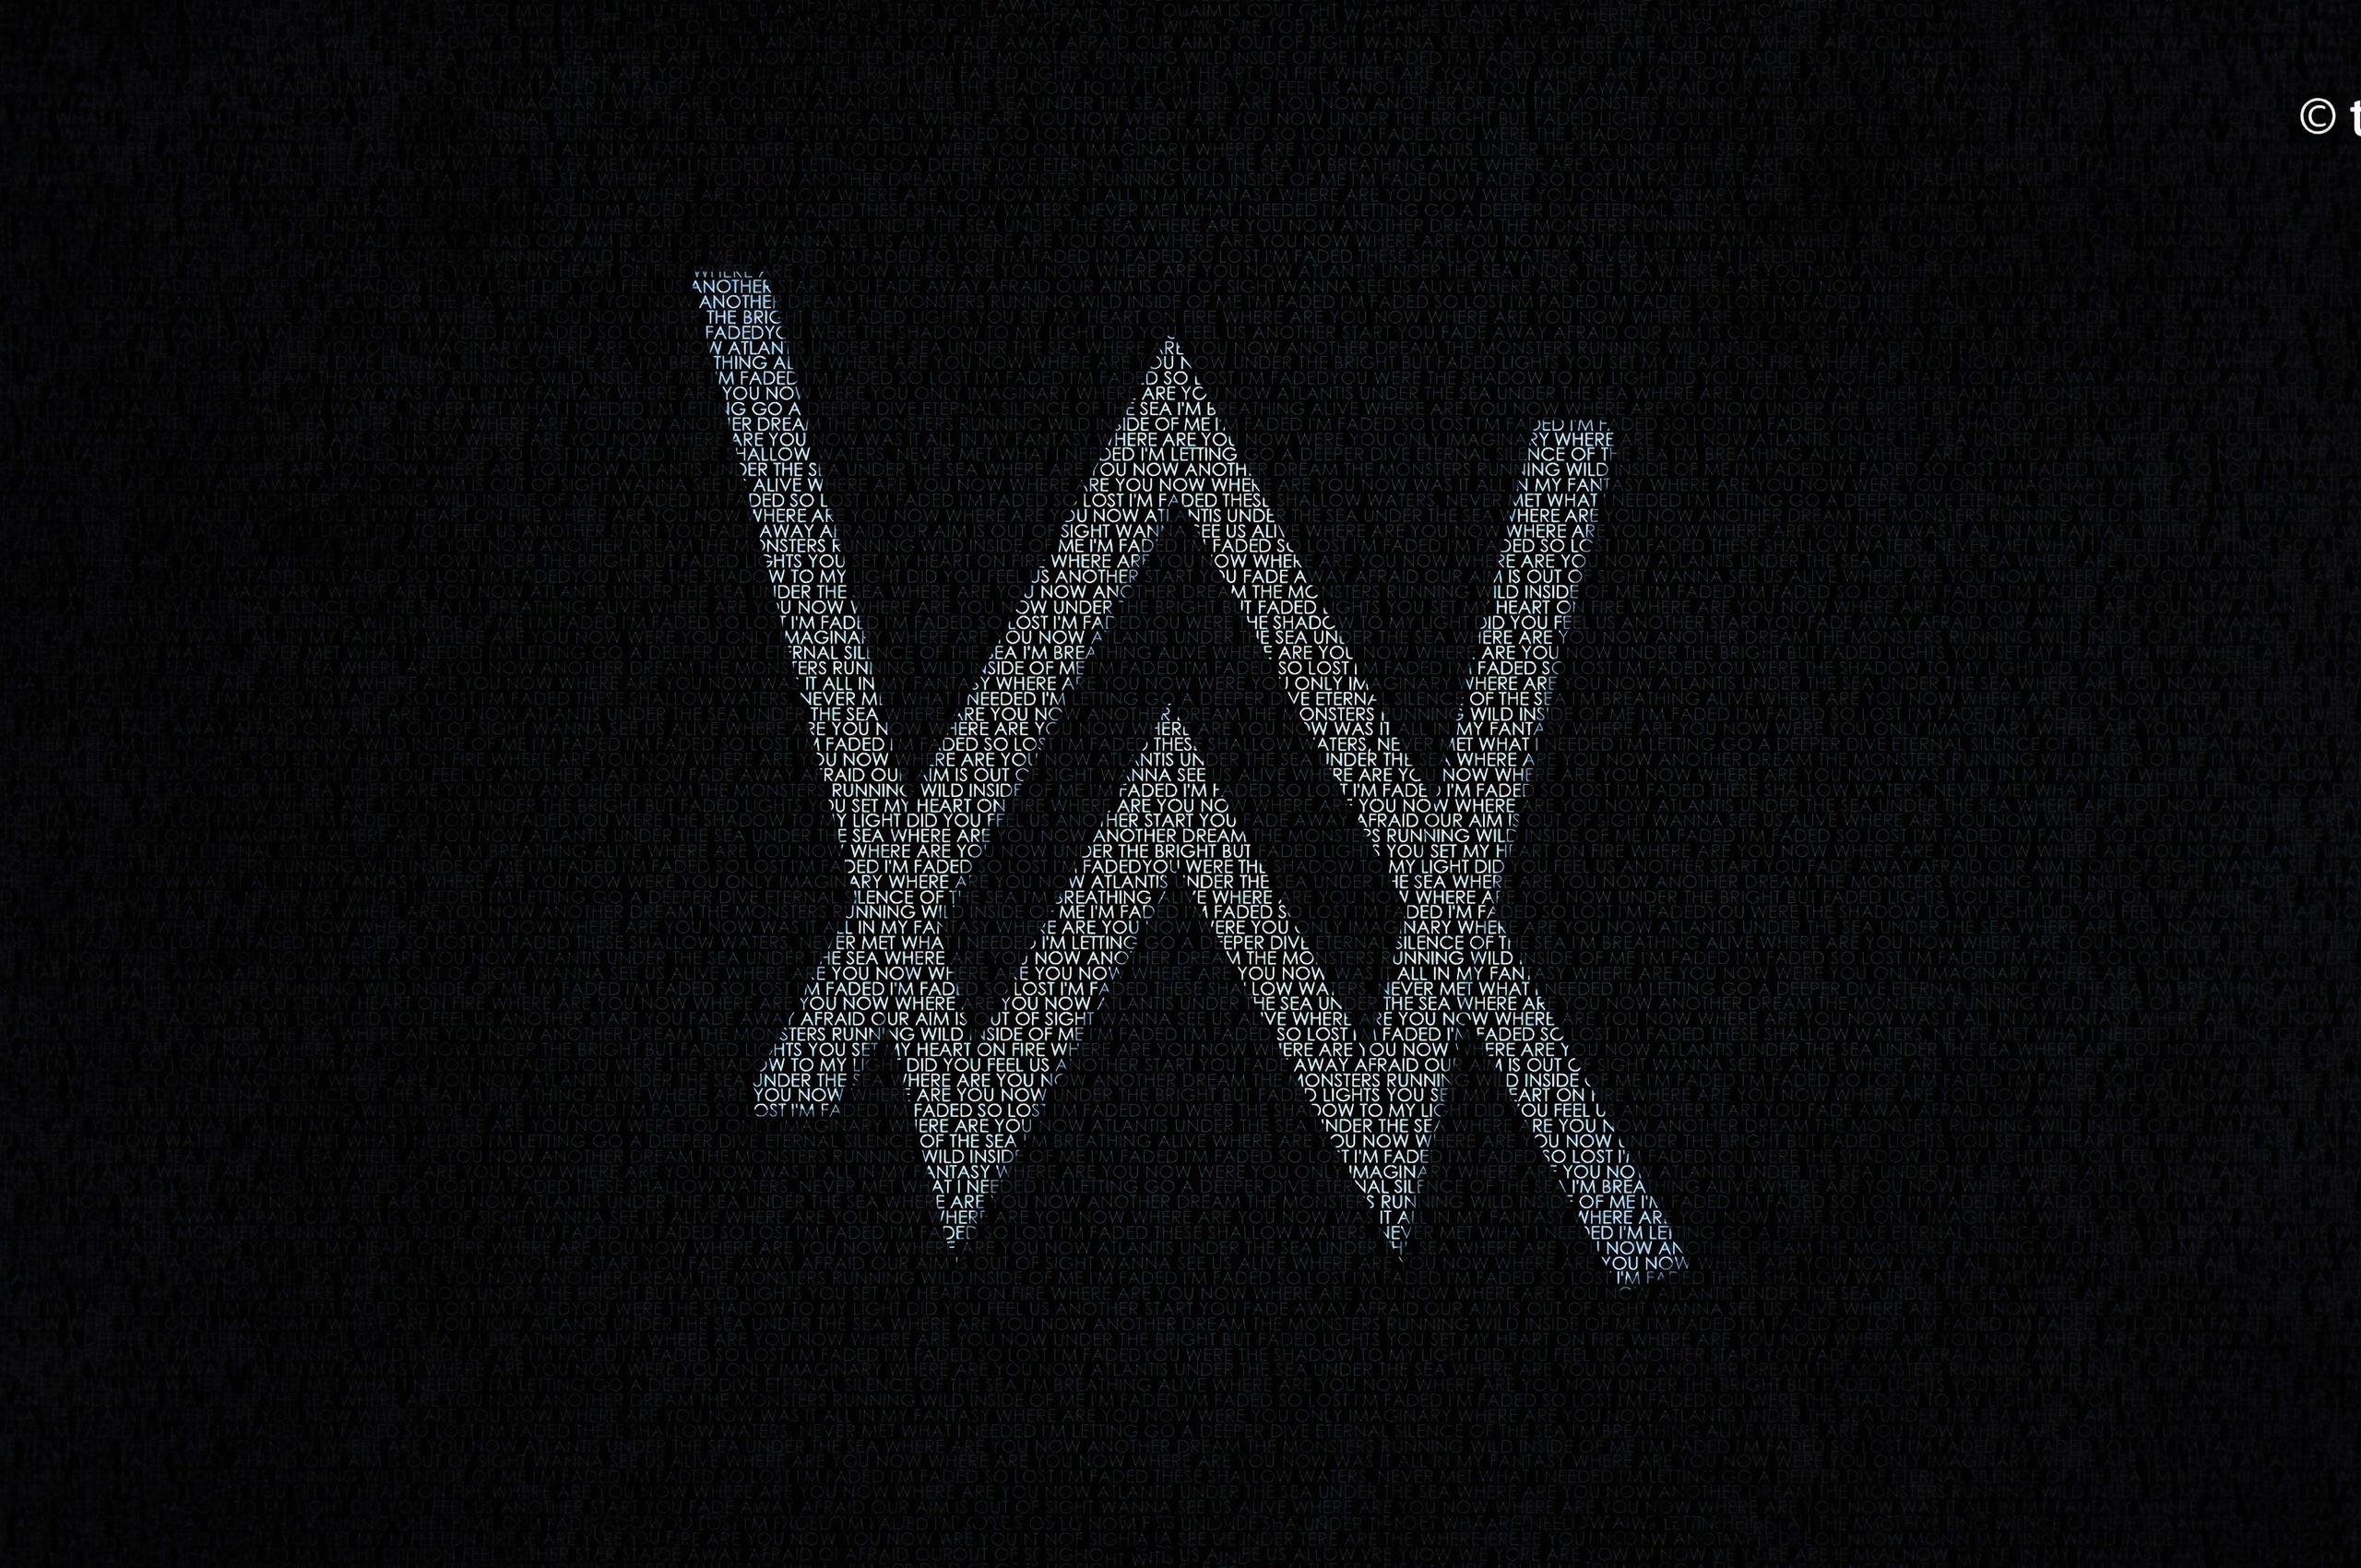 alan-walker-typography-4k-4y.jpg